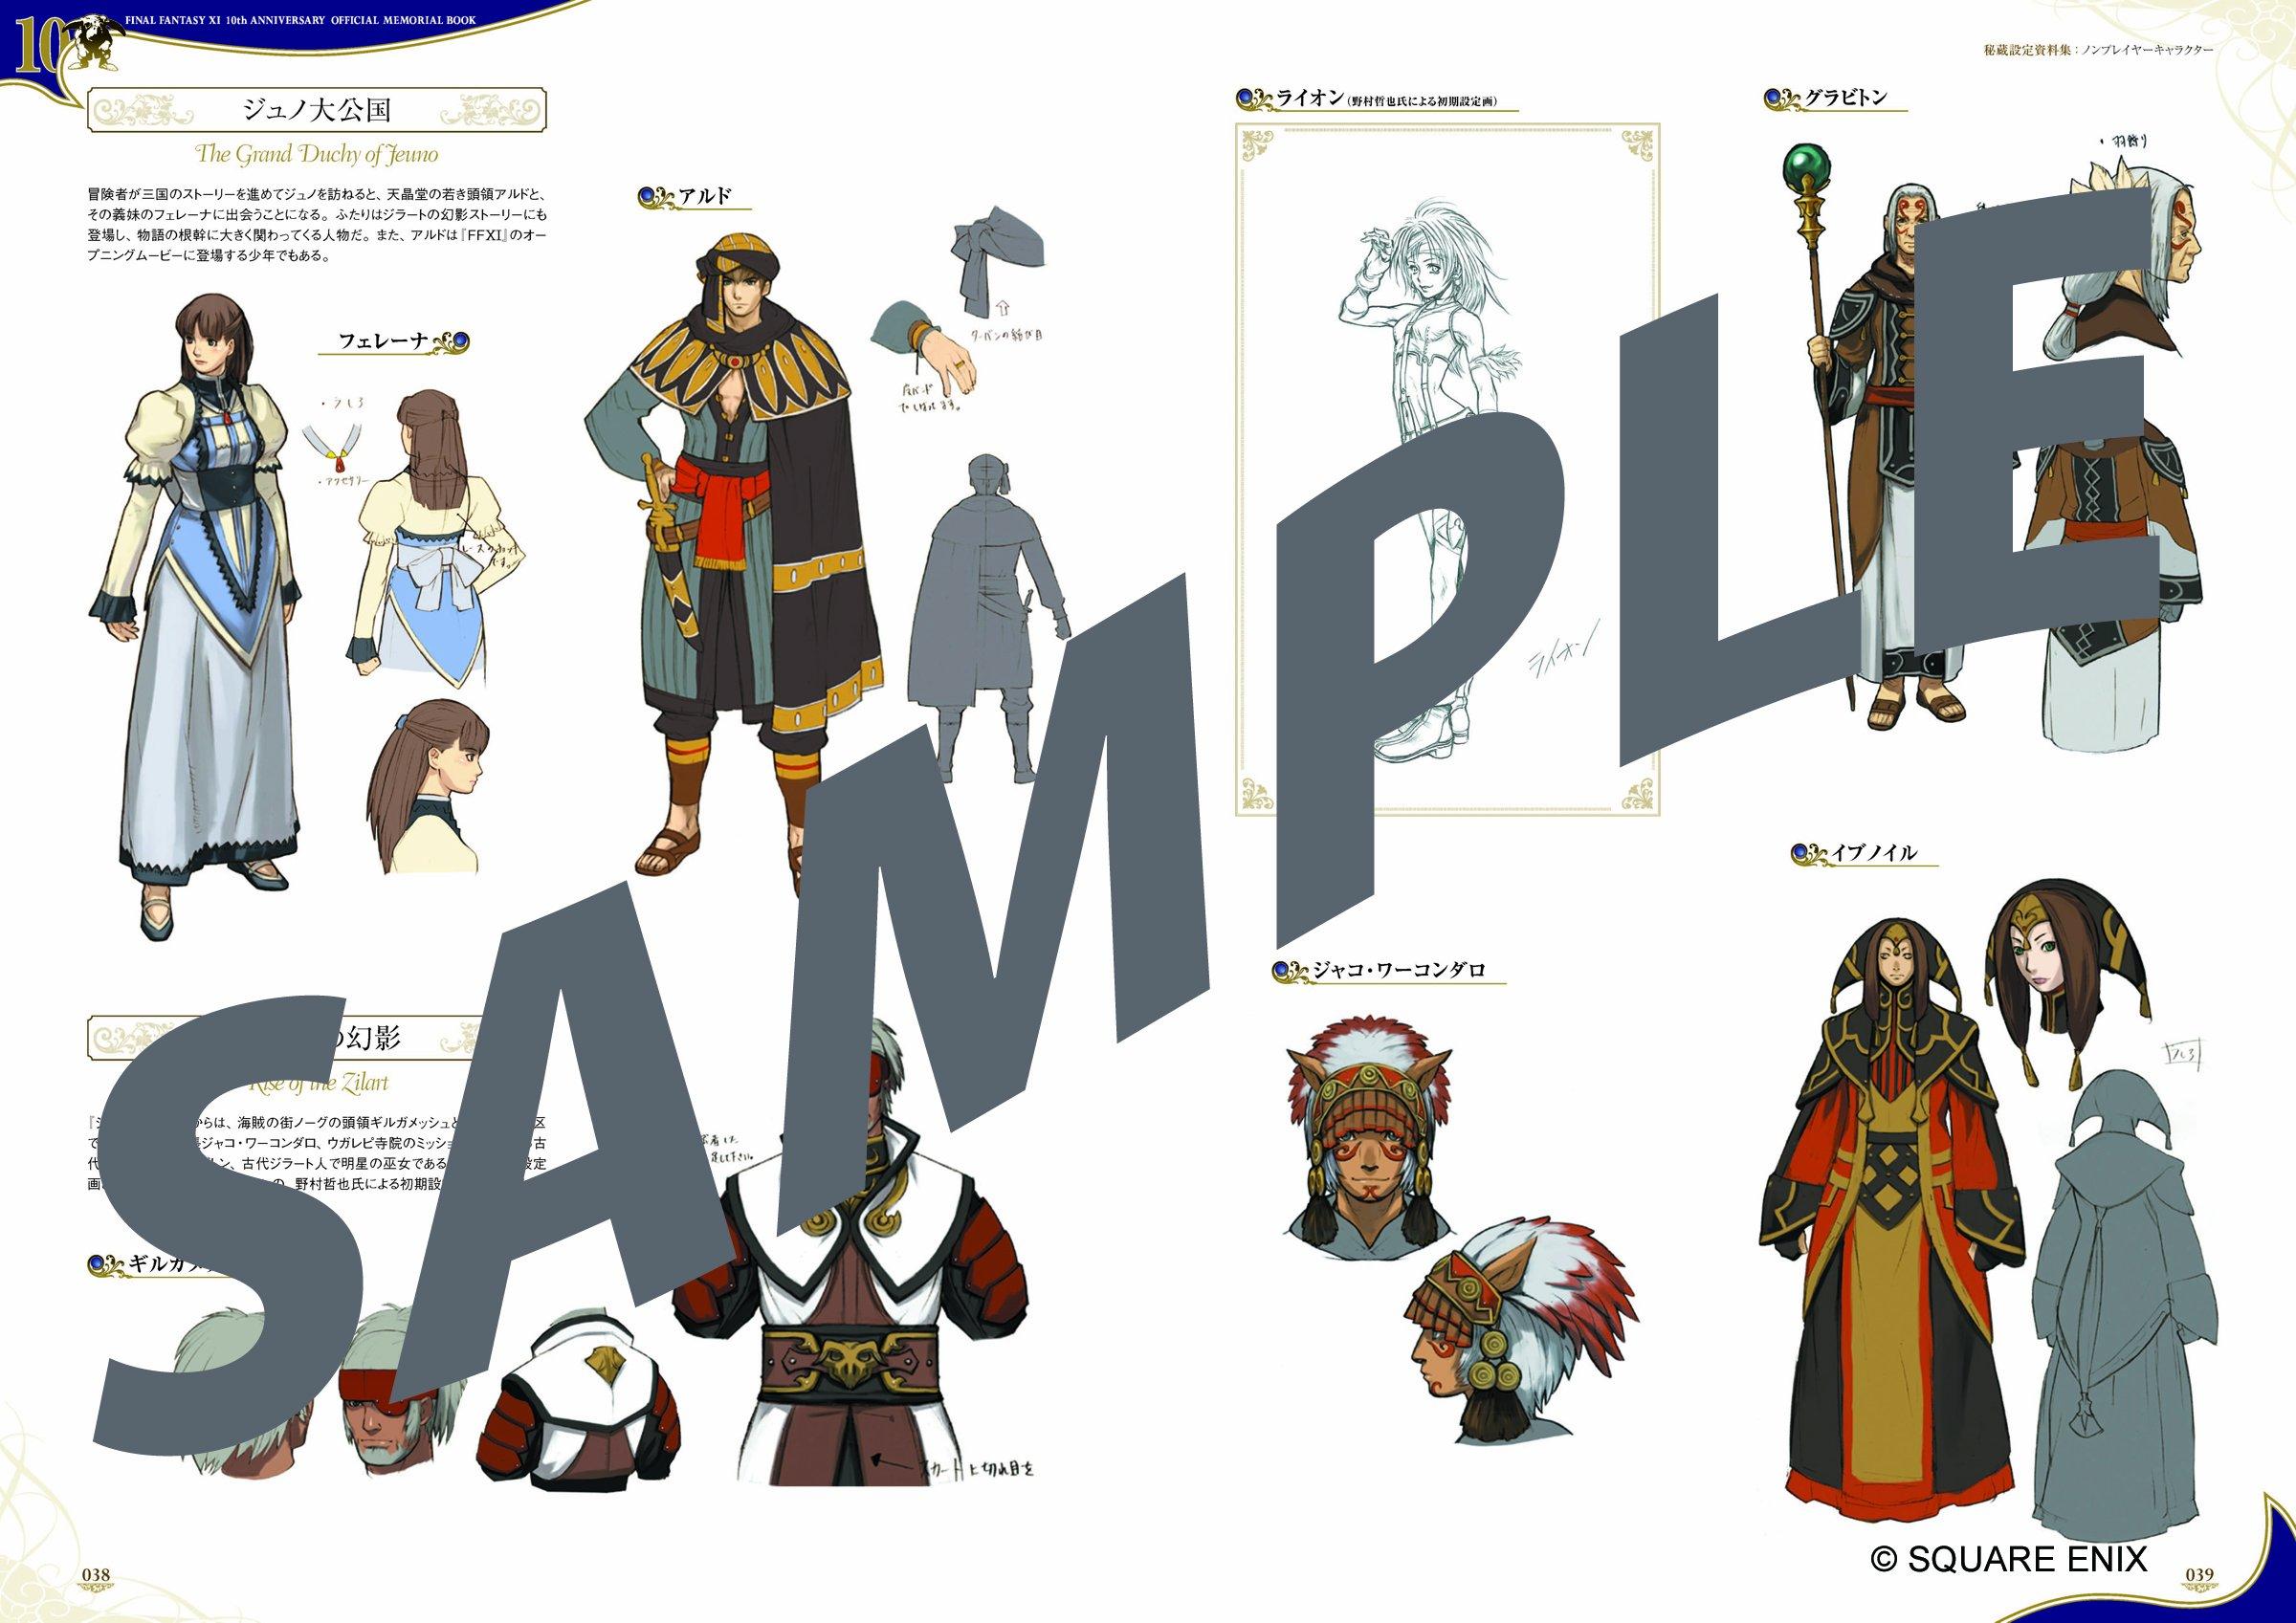 Final Fantasy Xi 10th Anniversary Official Memorial Book a